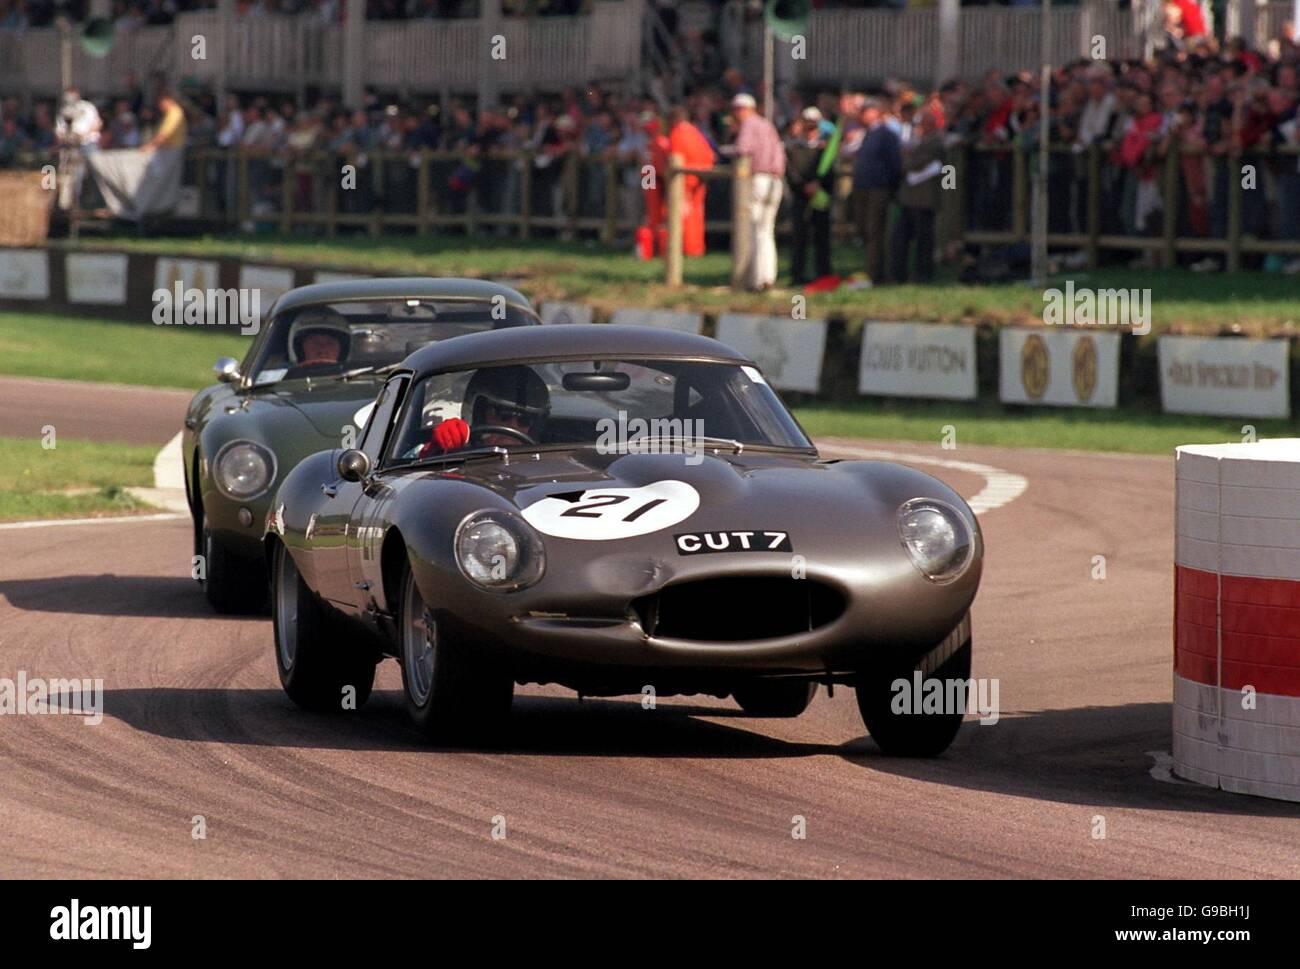 Motor Racing - Goodwood Revivalist Meeting - The RAC TT Celebration - Stock Image